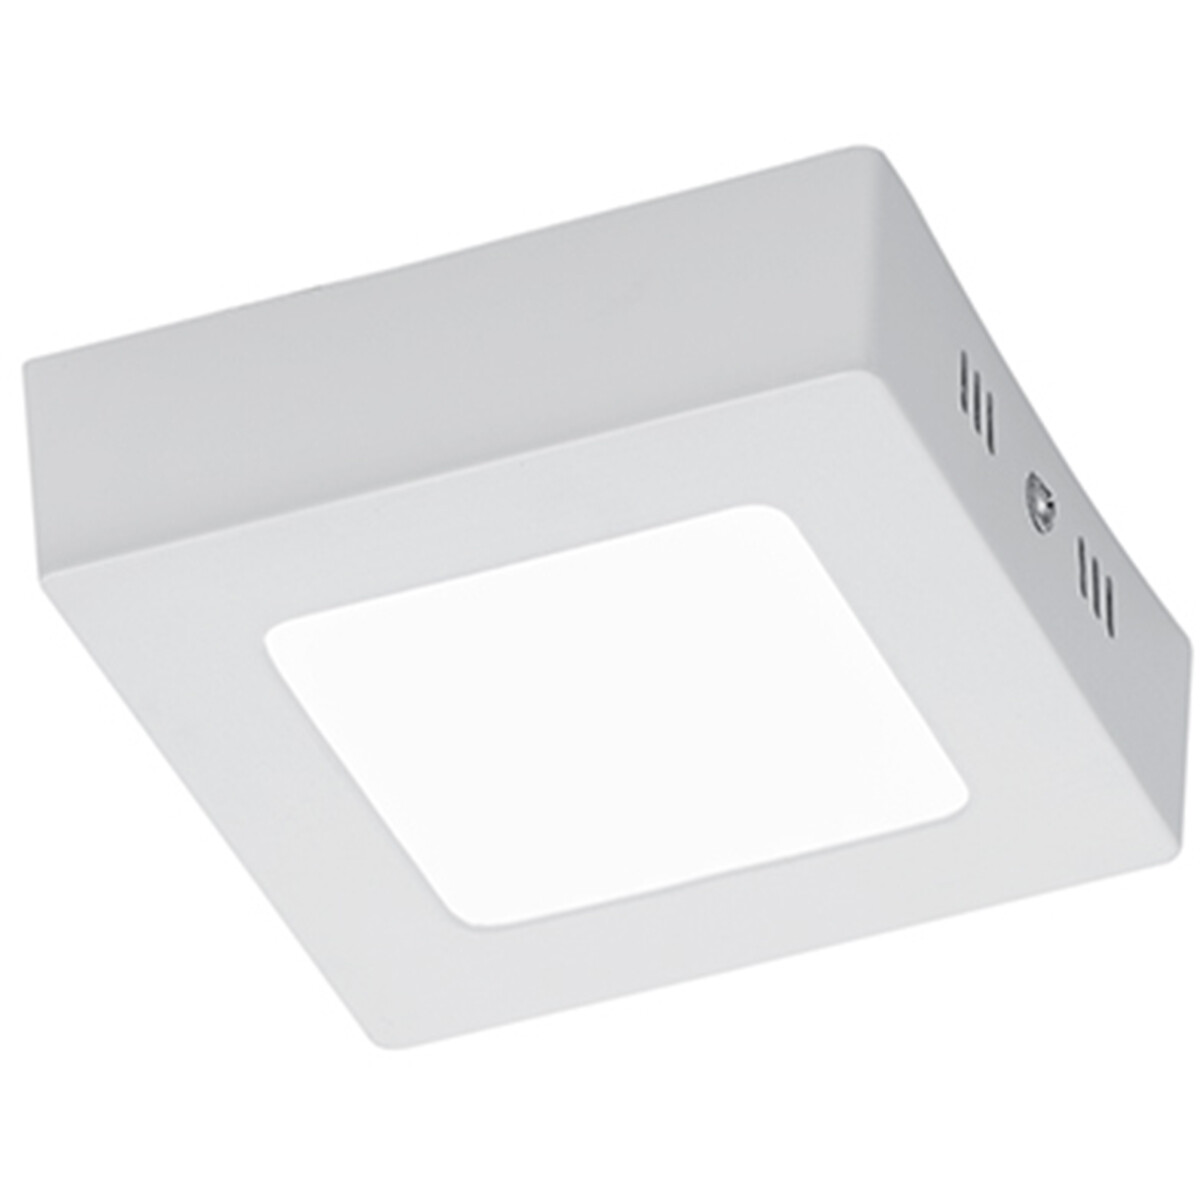 LED Plafondlamp - Plafondverlichting - Trion Zonin - 5W - Warm Wit 3000K - Vierkant - Mat Wit - Alum